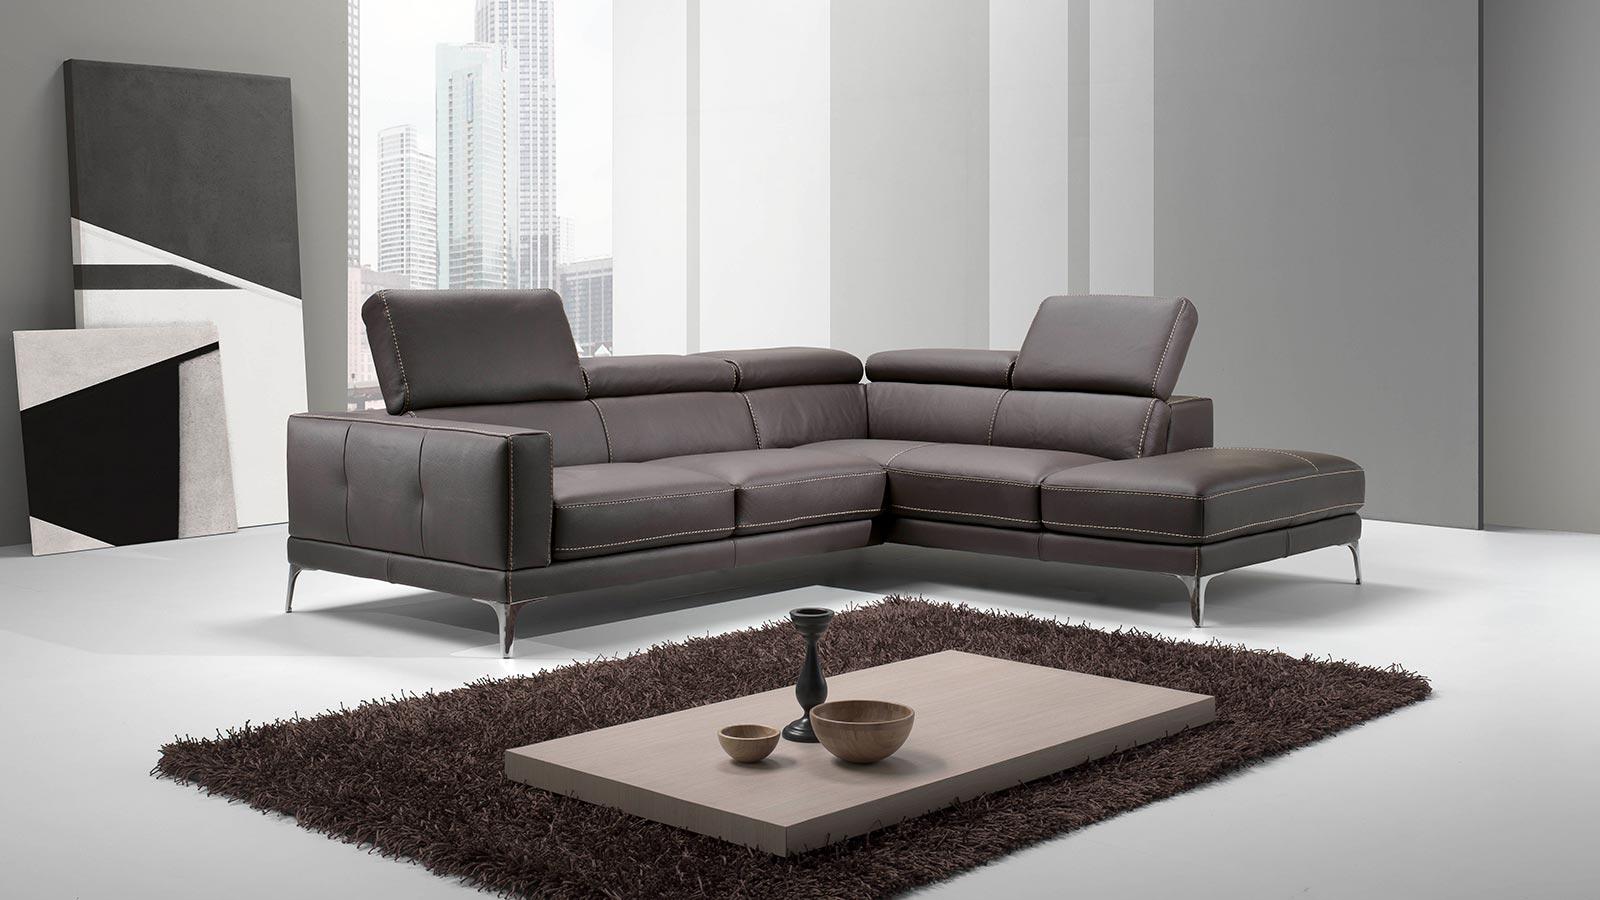 Sofas divatto 201458 revista muebles mobiliario de dise o for Sofas divatto outlet